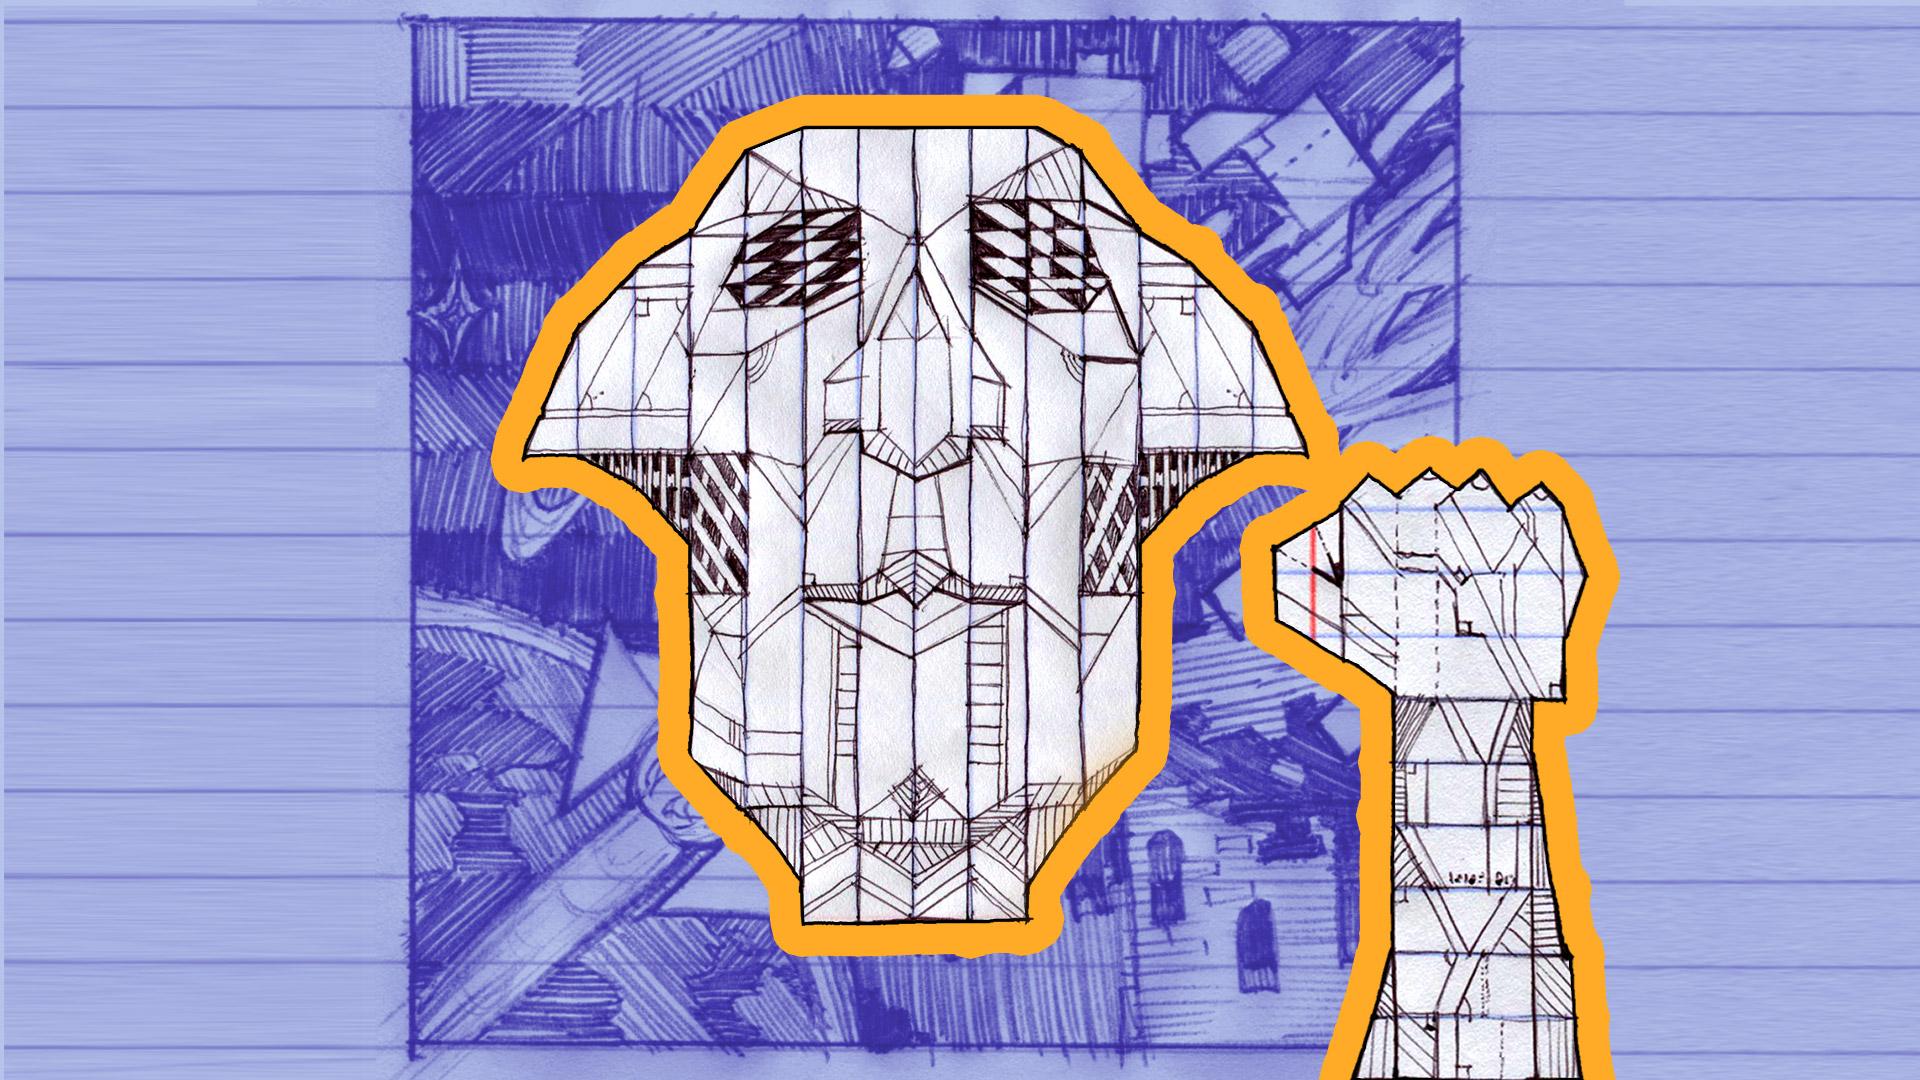 Steam Card Exchange Showcase Ballpoint Universe Infinite Baldeaglediagram Eagle Skeleton Drawing Bald Study 01 By Baron 7 Of 11artwork Logician Lord